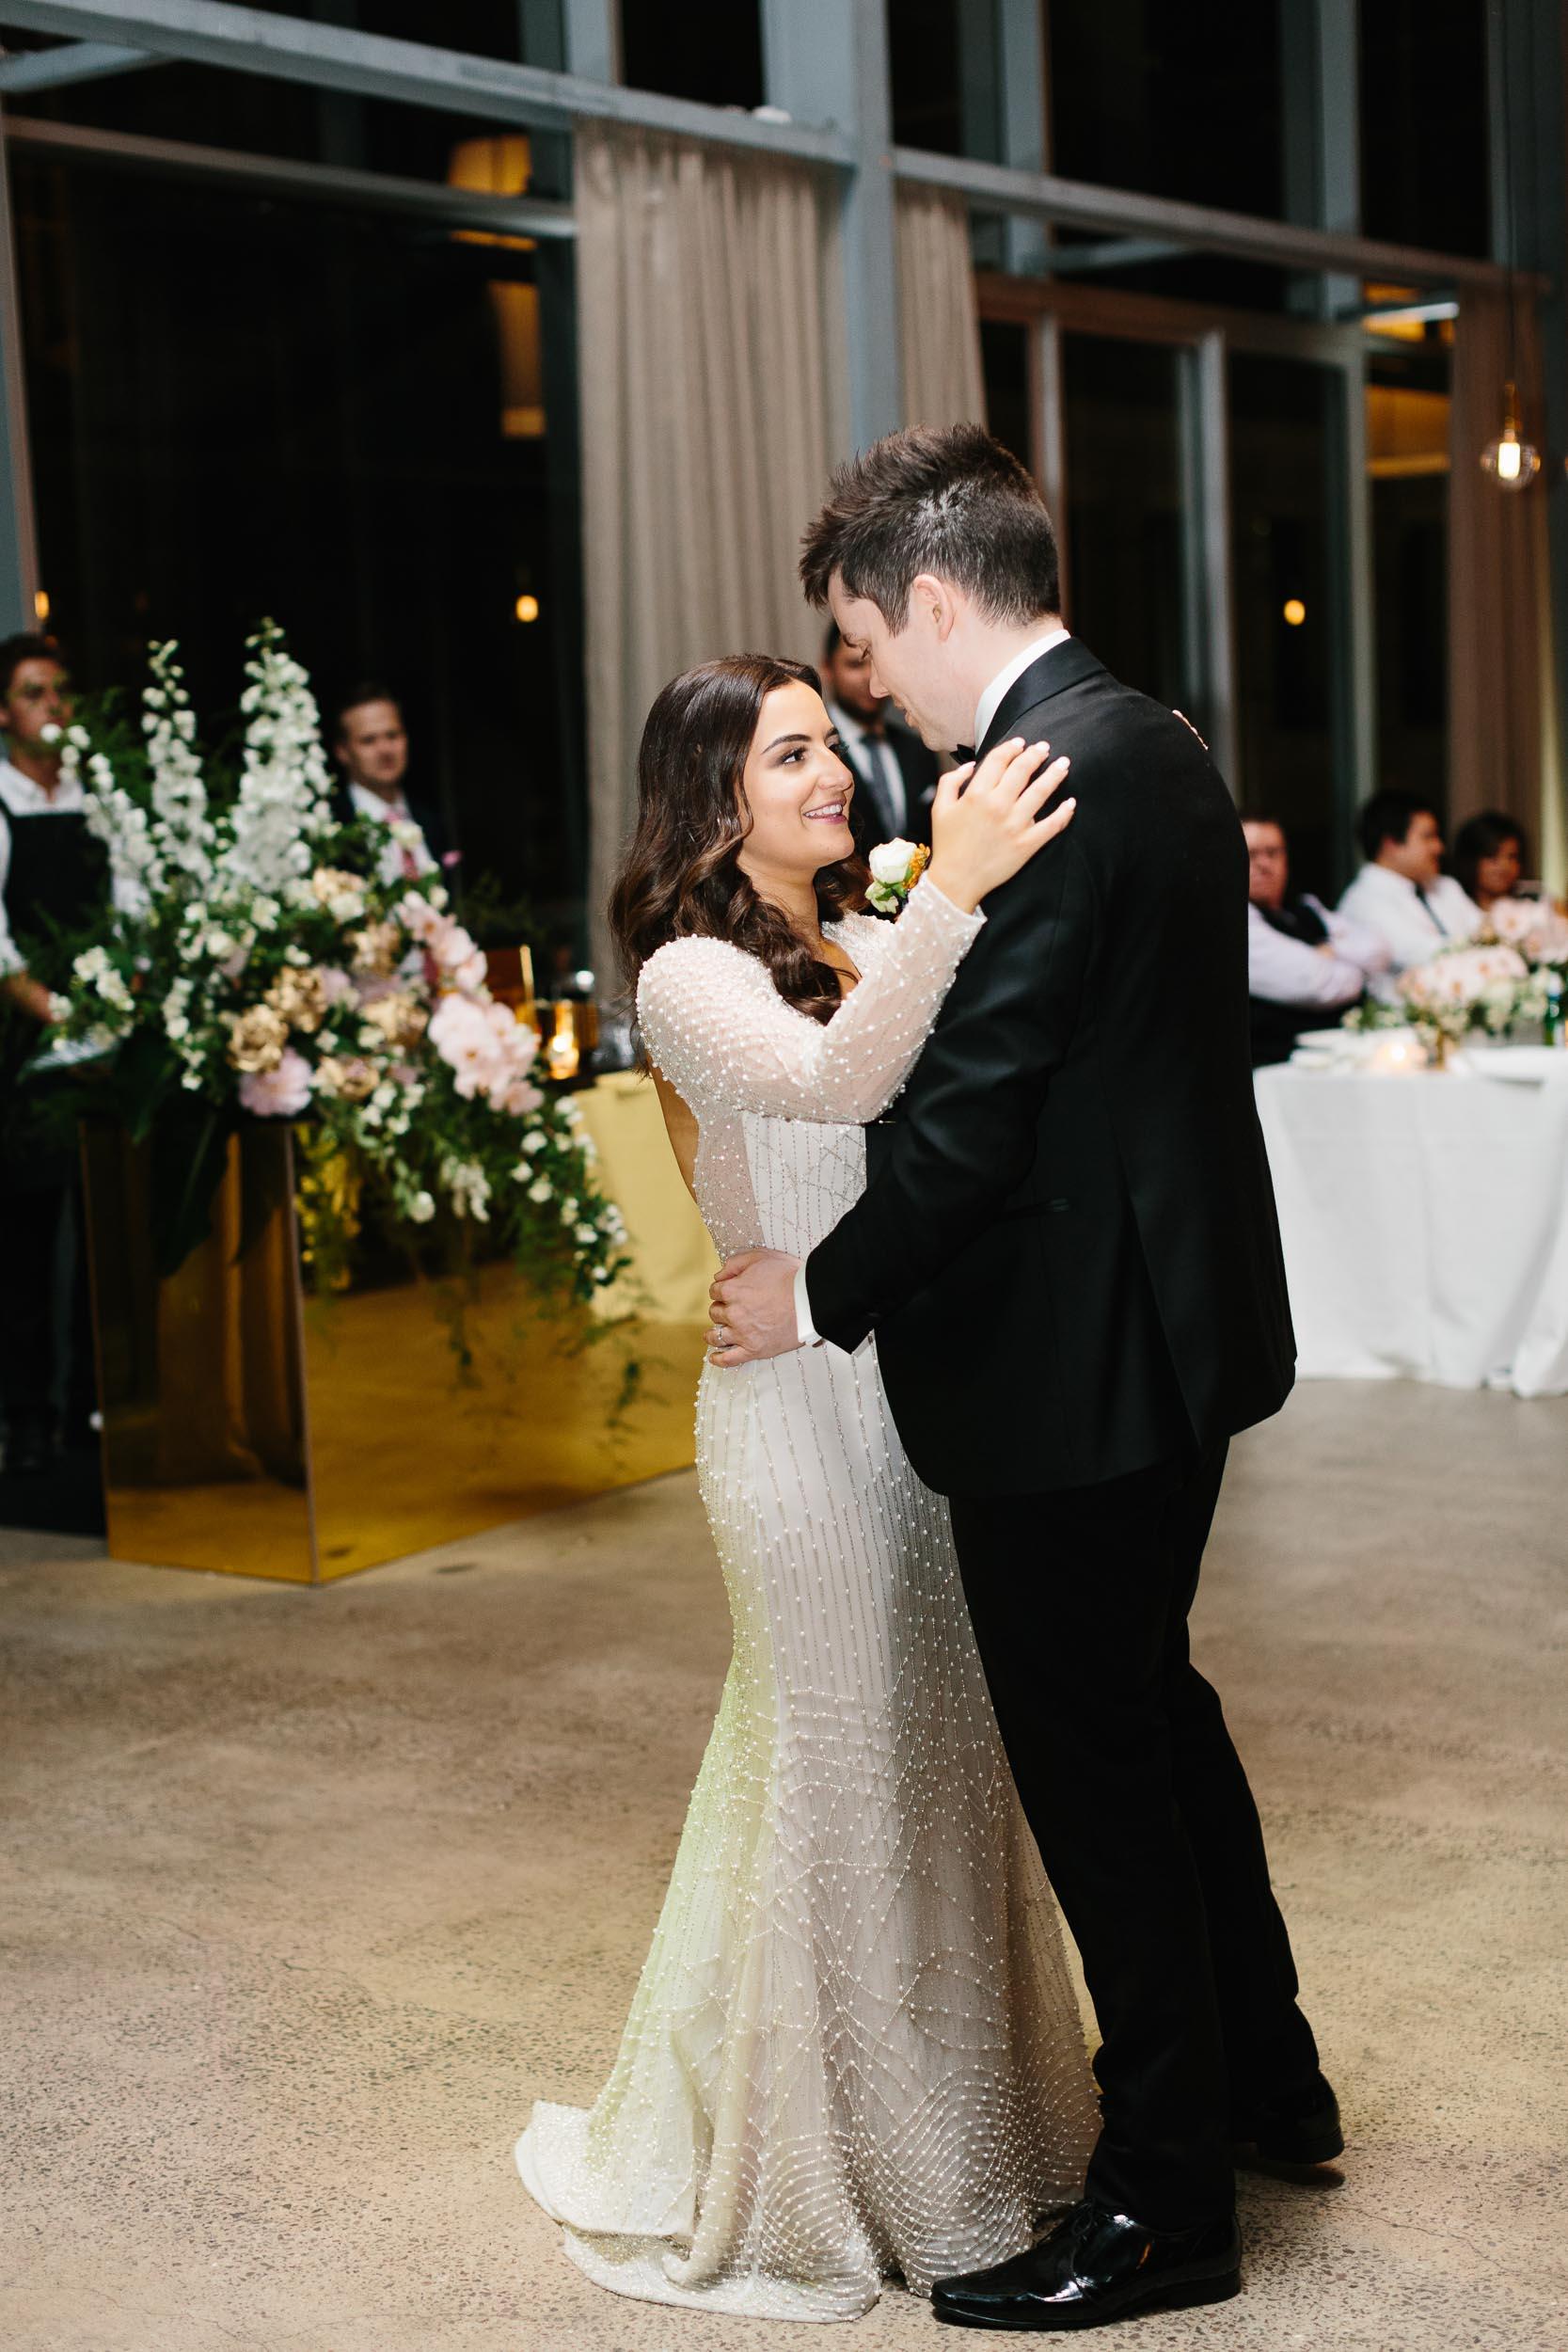 Kas-Richards-Wedding-Photographer-Melbourne-City-Wedding-Alto-Event-Space-Jane-Hill-Bridal-Gown-69.jpg